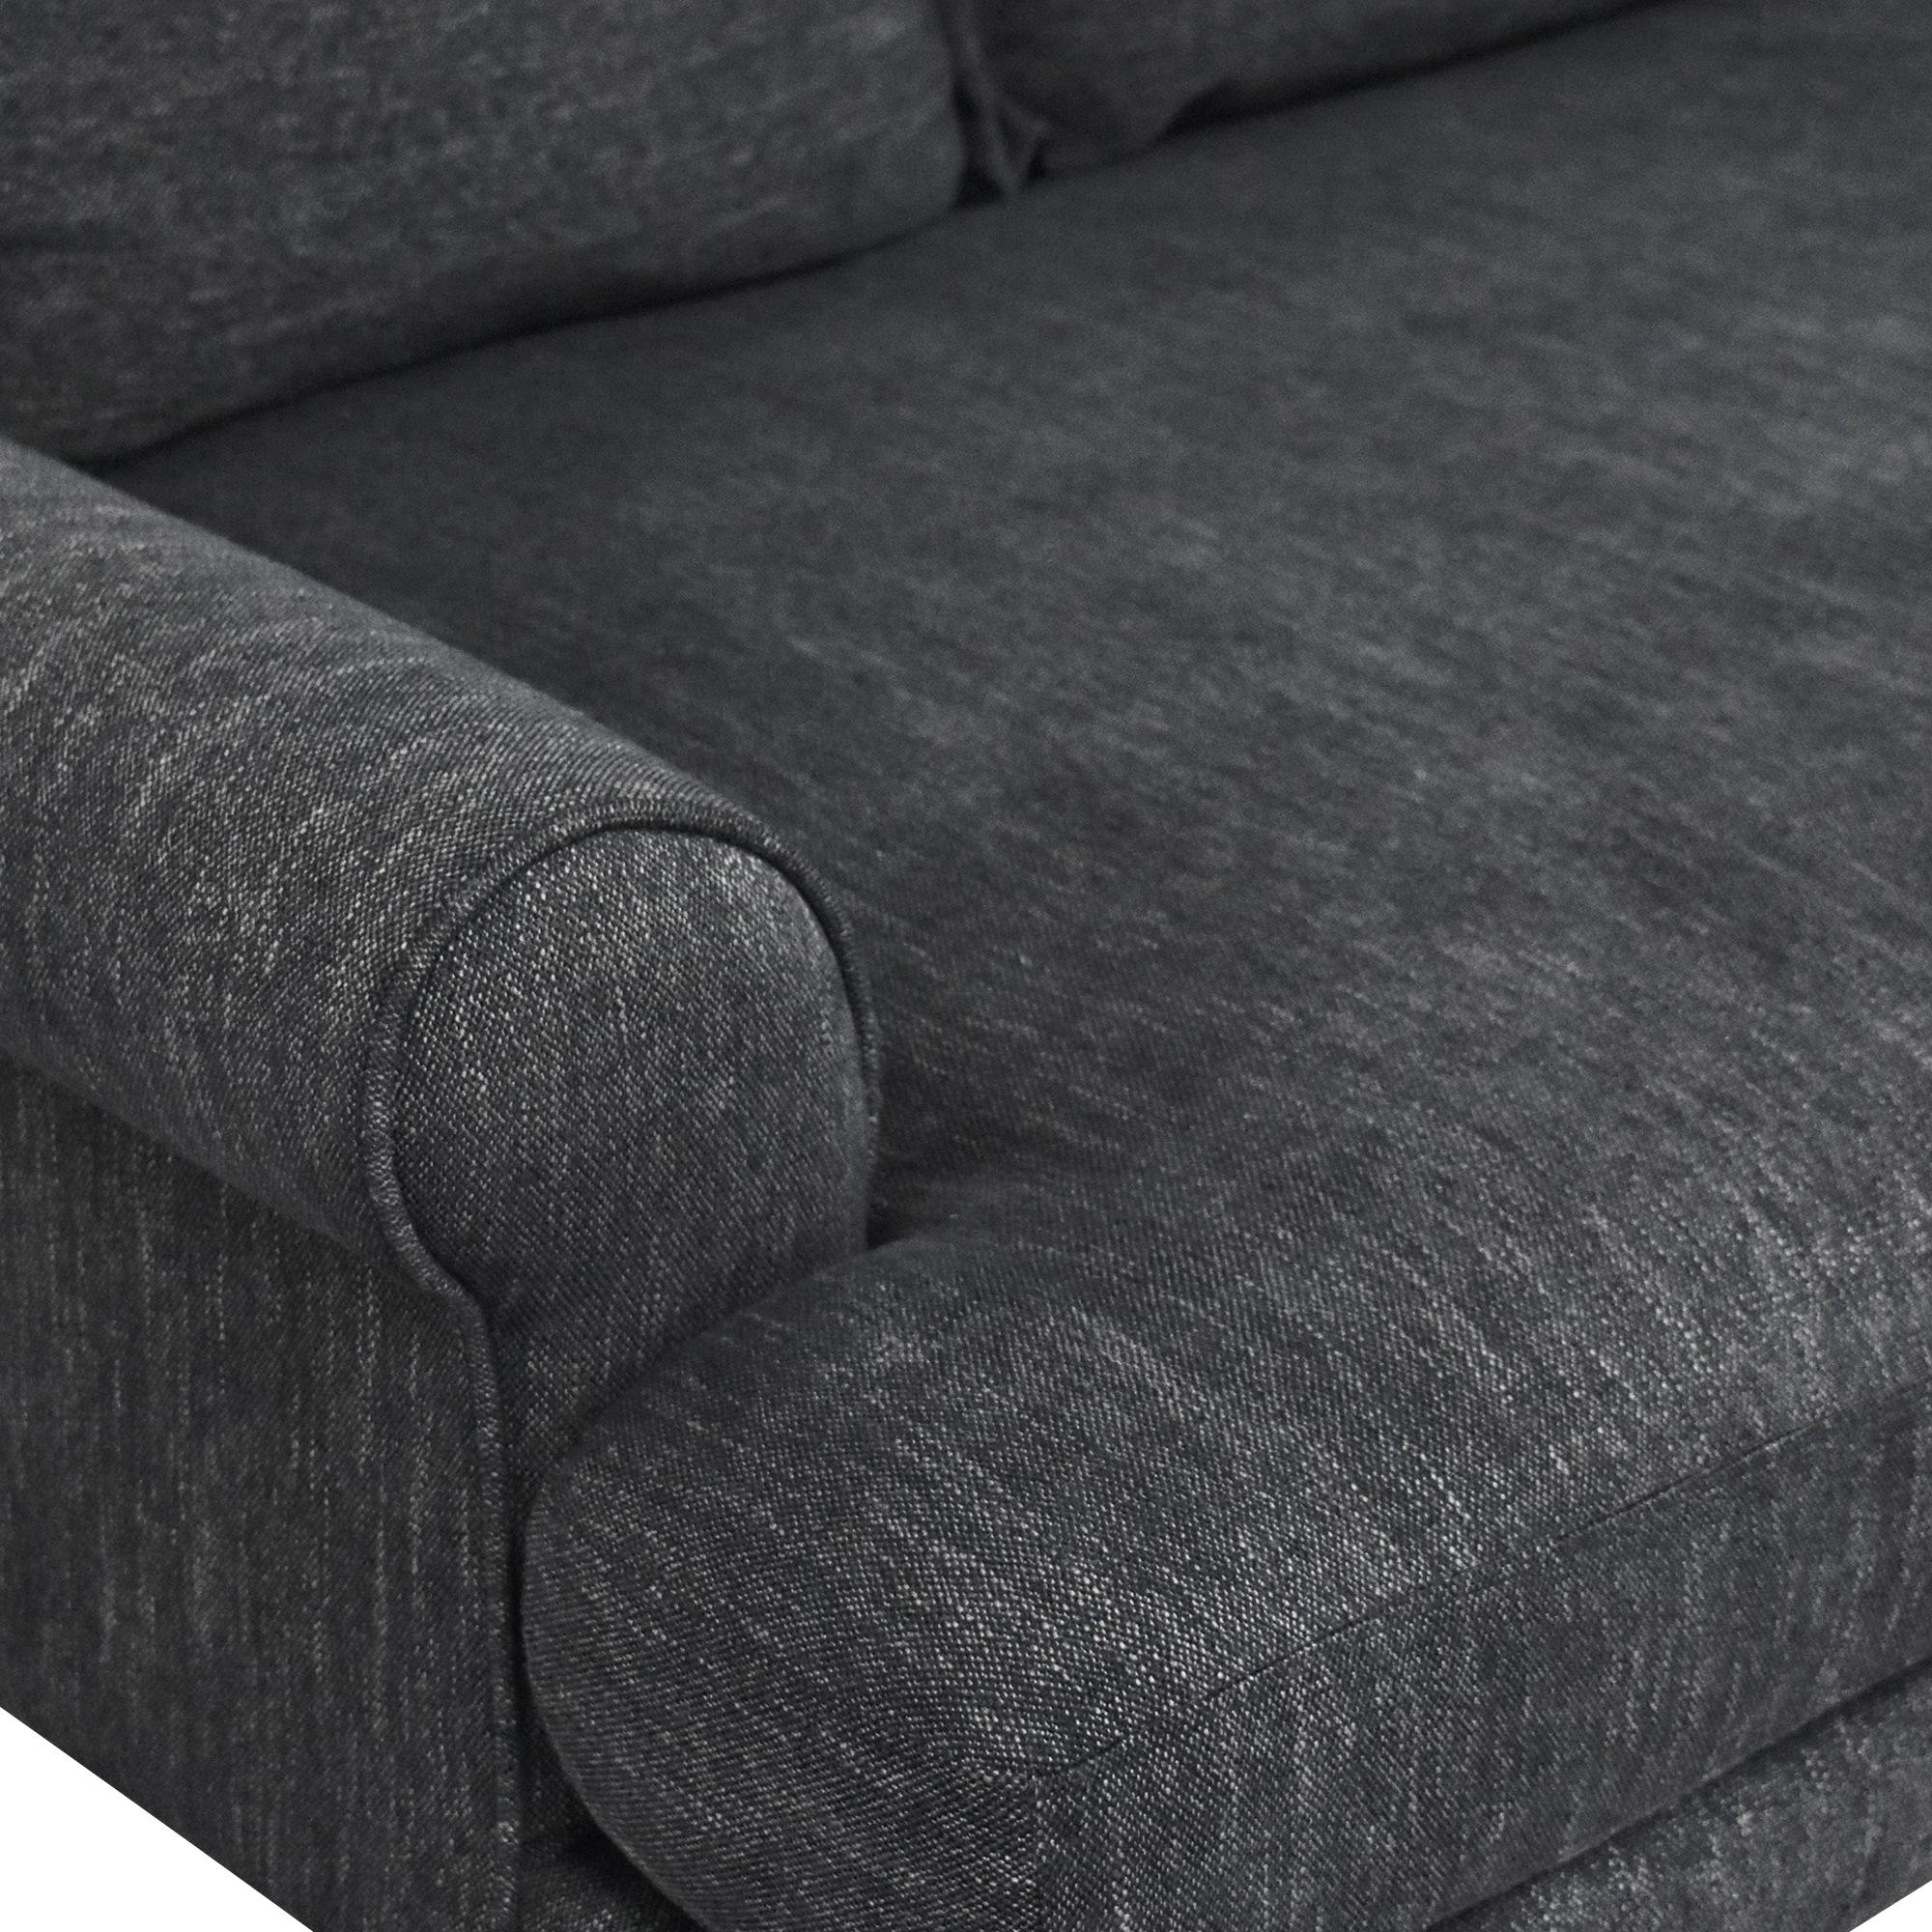 Interior Define Interior Define Maxwell Bench Cushion Sofa coupon